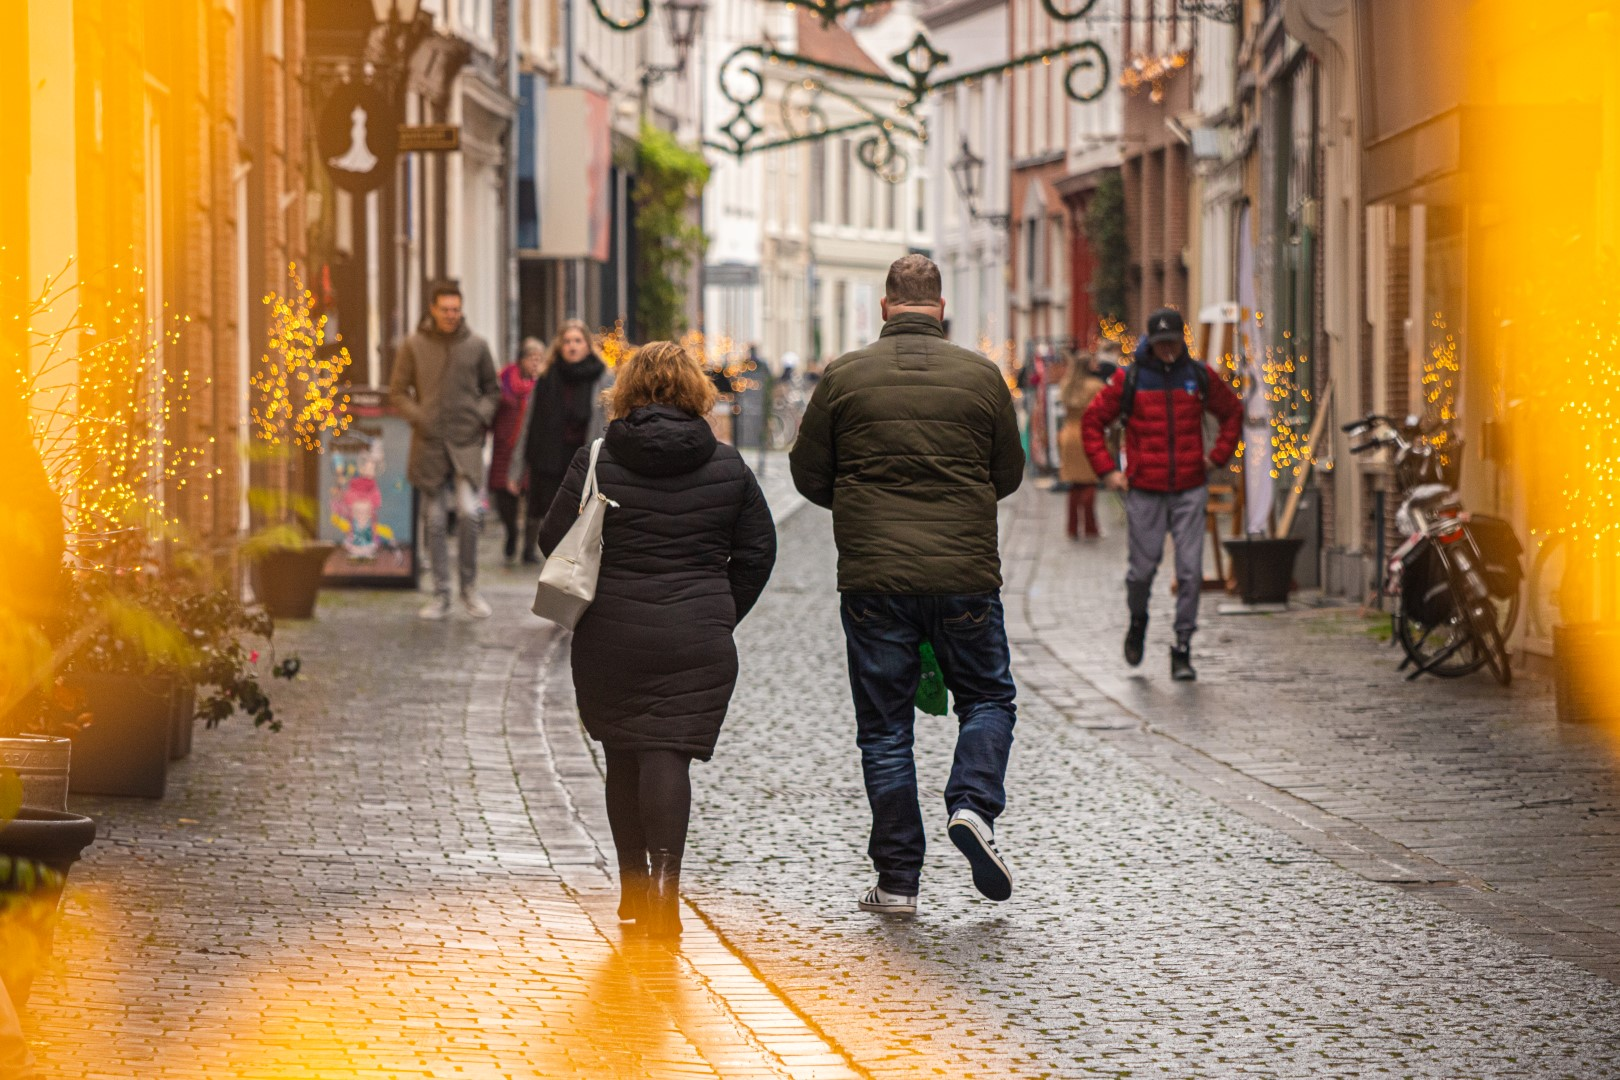 vierkantje winkelen winkelende mensen drukte shoppen winkelstraat december winter